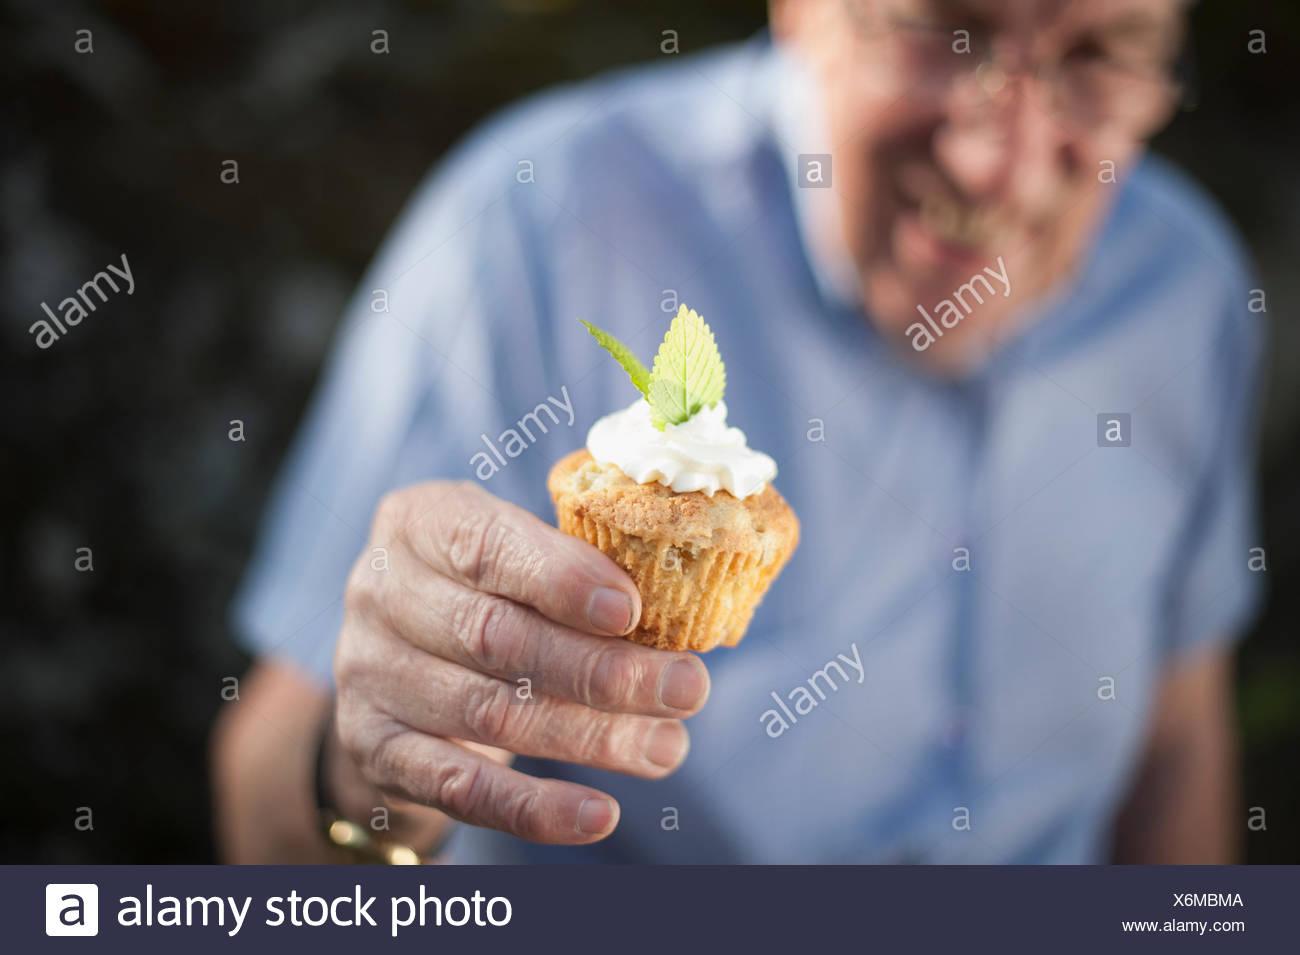 Senior man holding cupcake Photo Stock